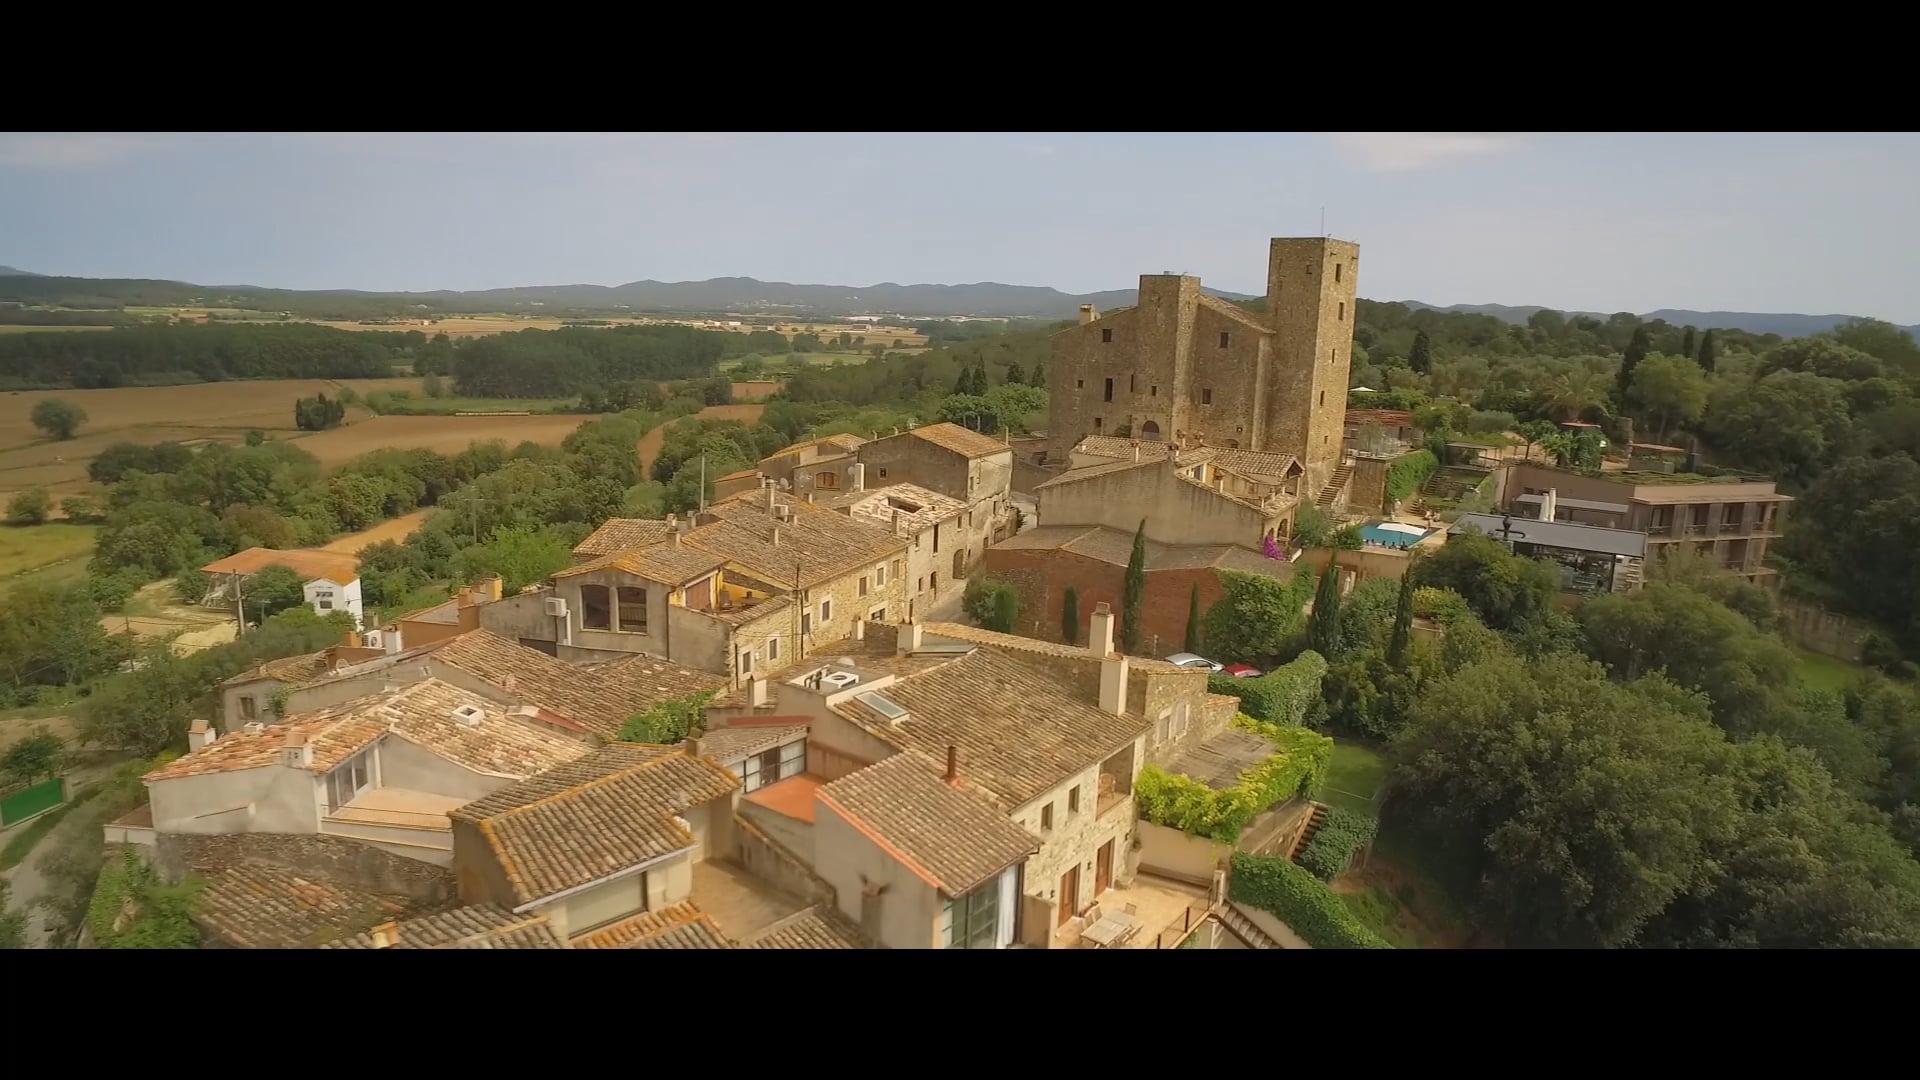 SPAIN: ROLF & JOËLLA | SAME-DAY FILM